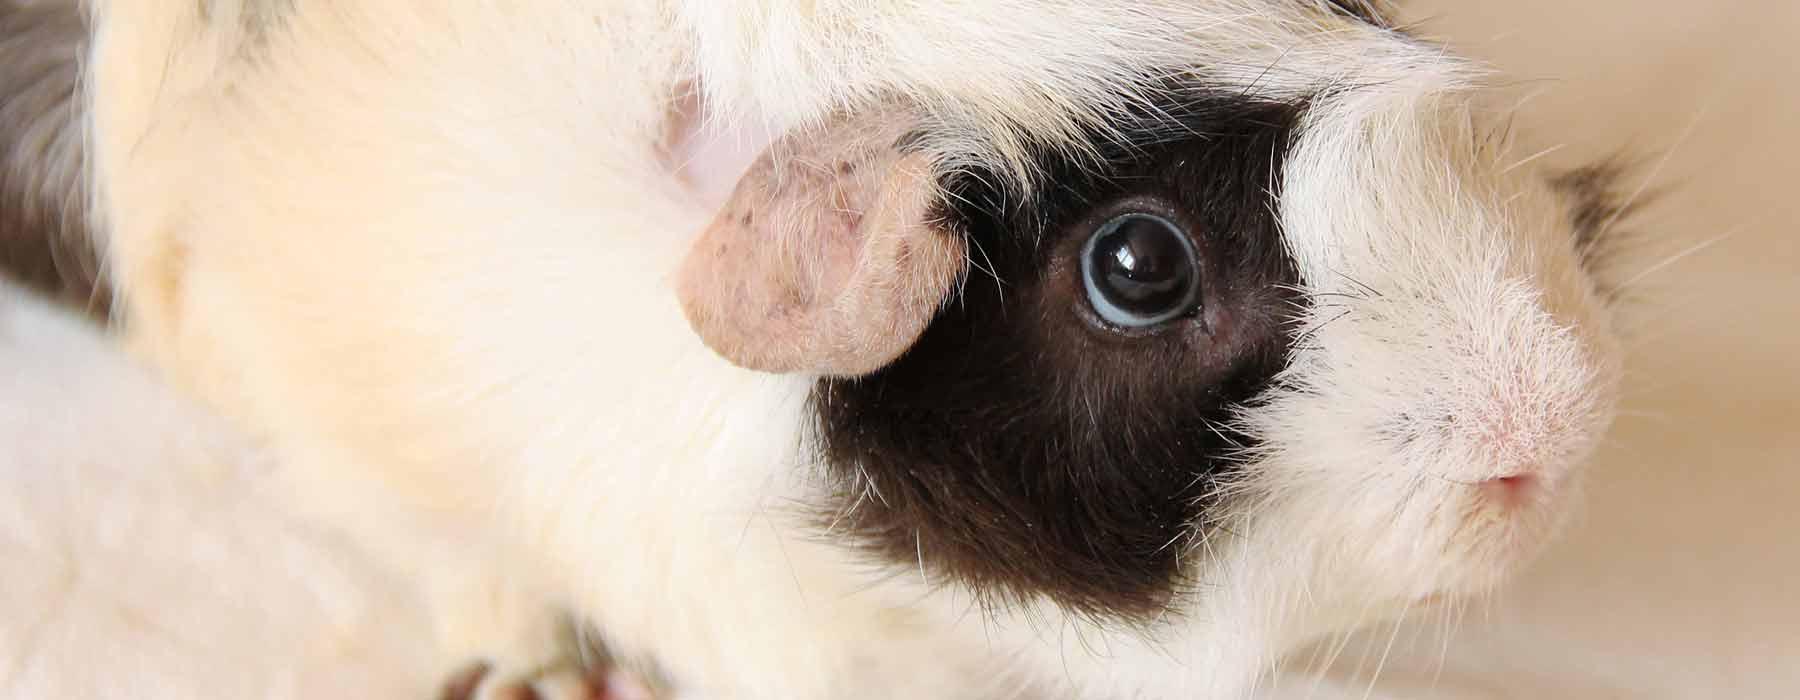 White and black guinea pig